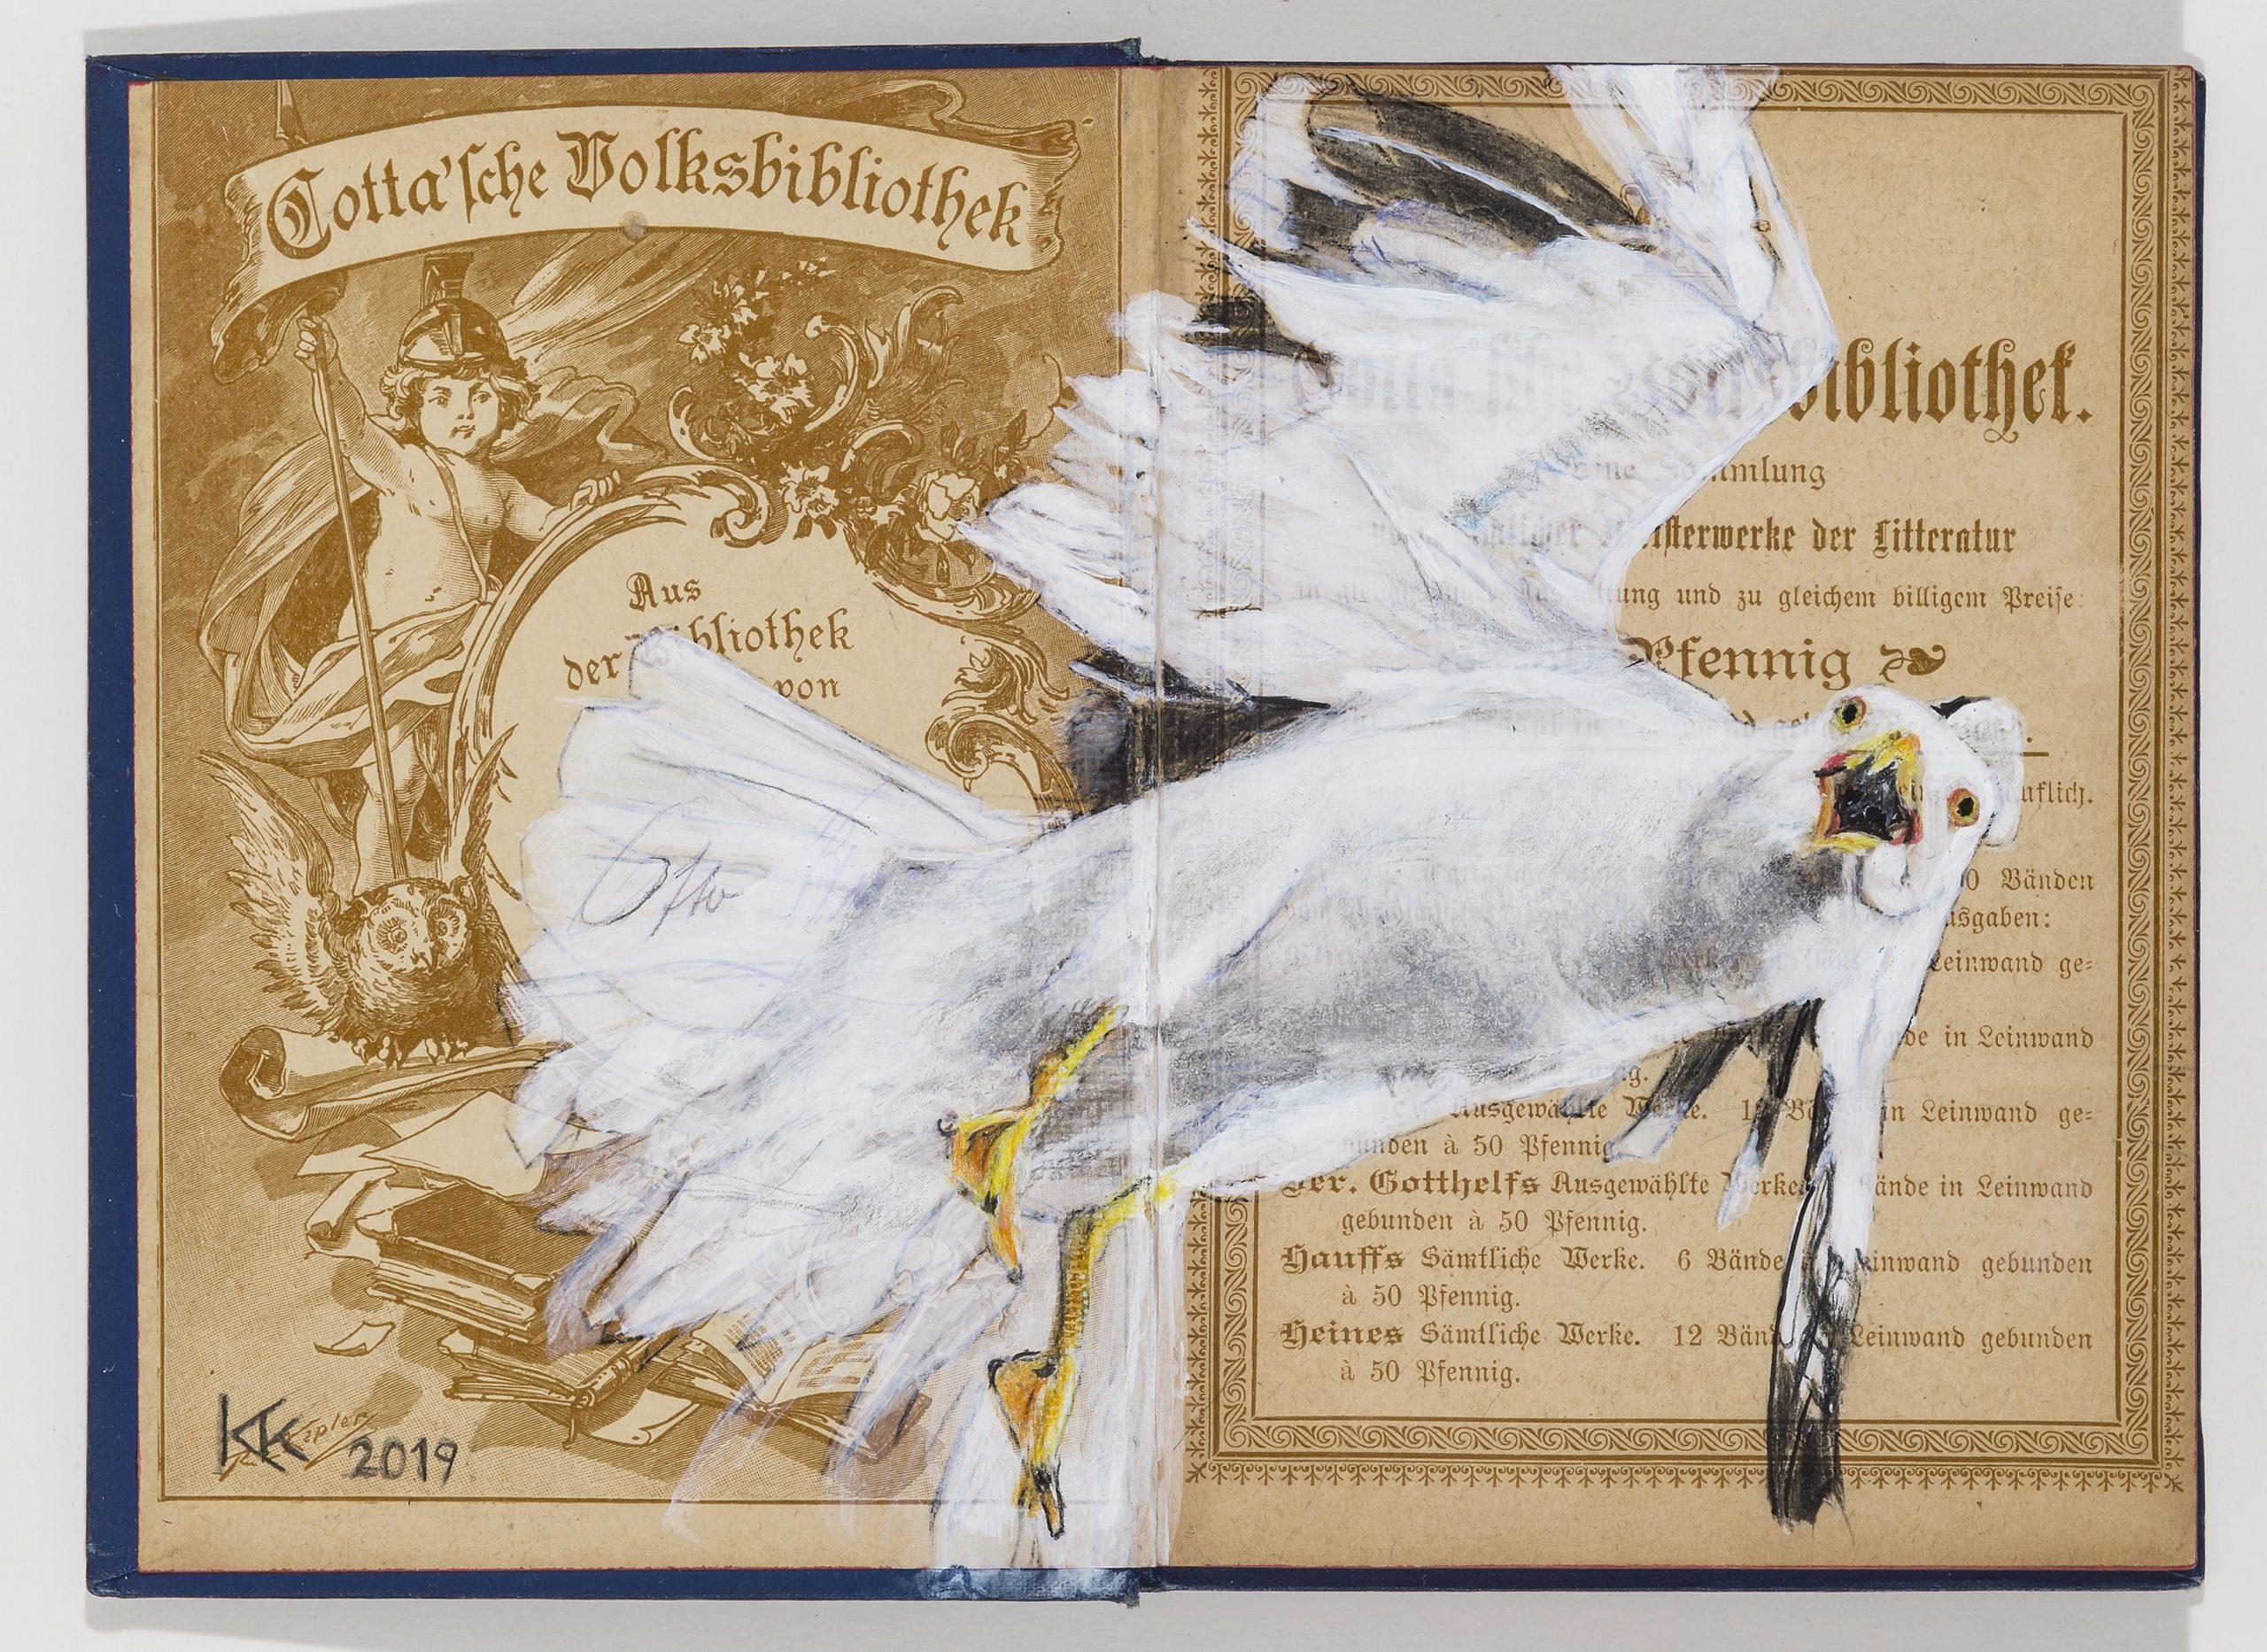 Black-headed Gull by Kristin Kolb